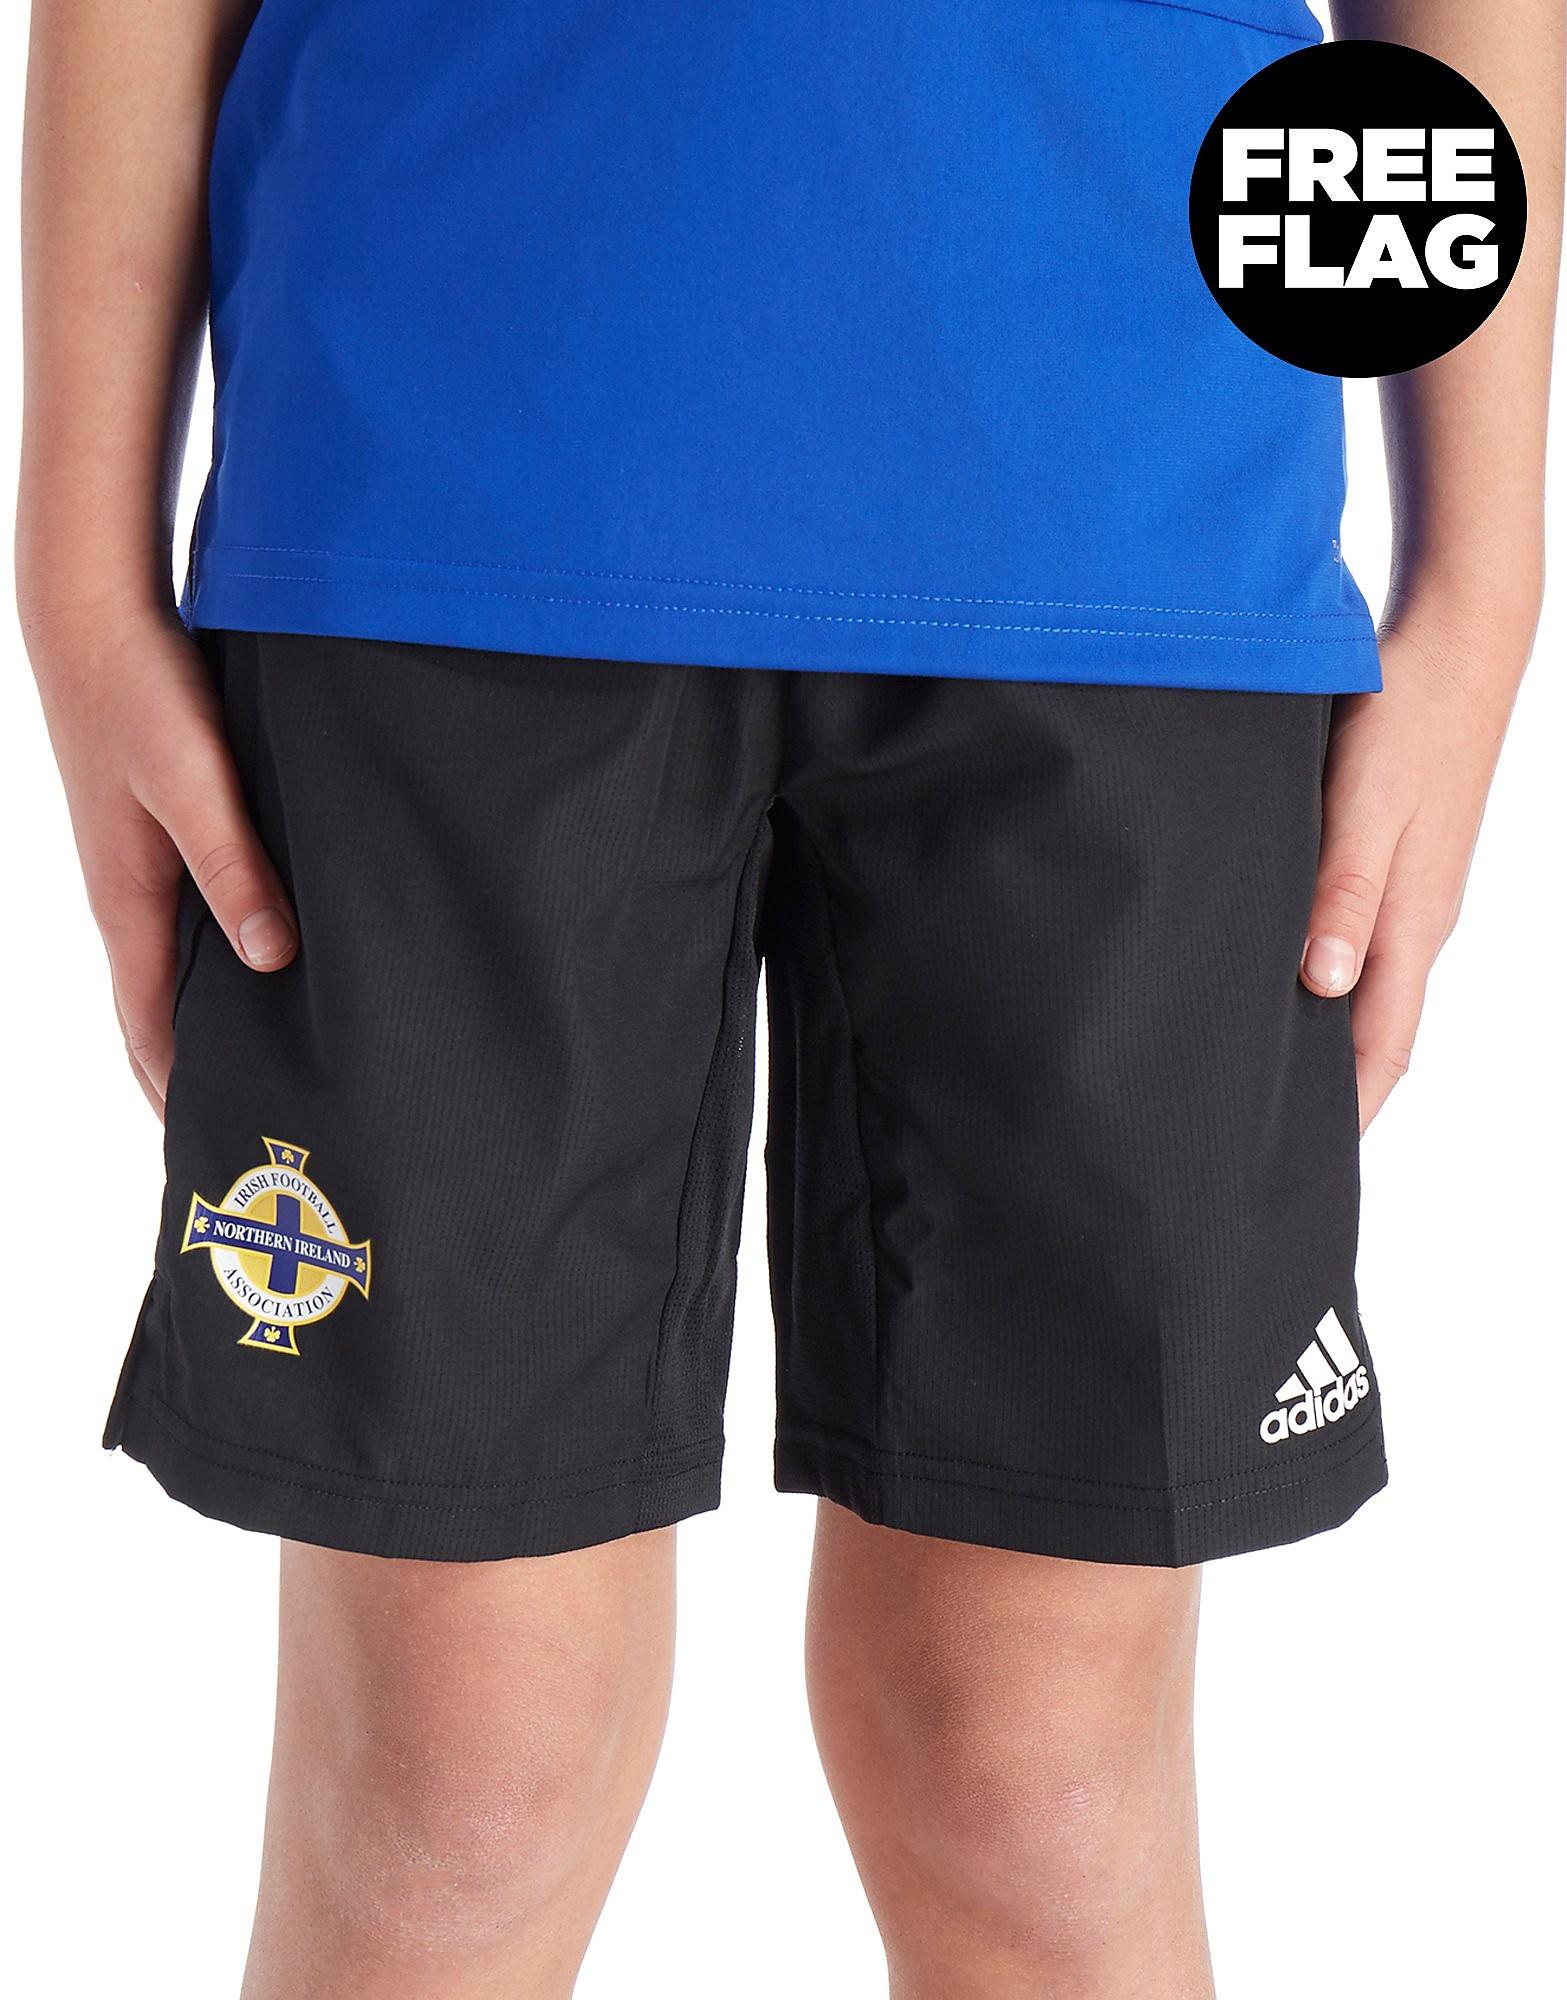 adidas Northern Ireland FA 2018 Woven Shorts Junior